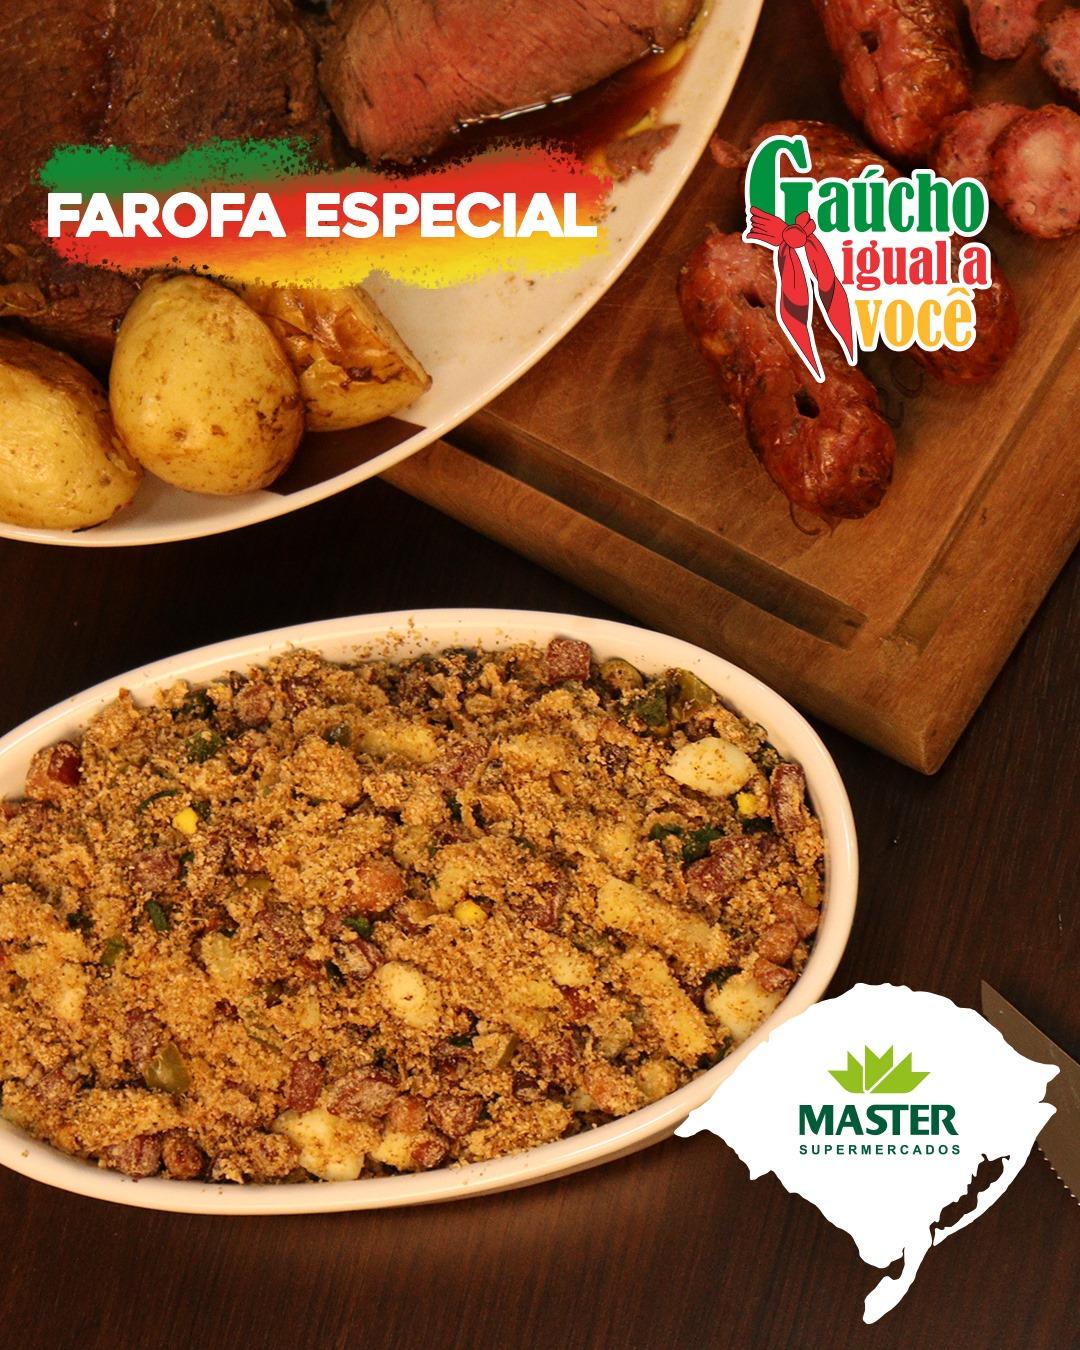 Farofa-master-especial